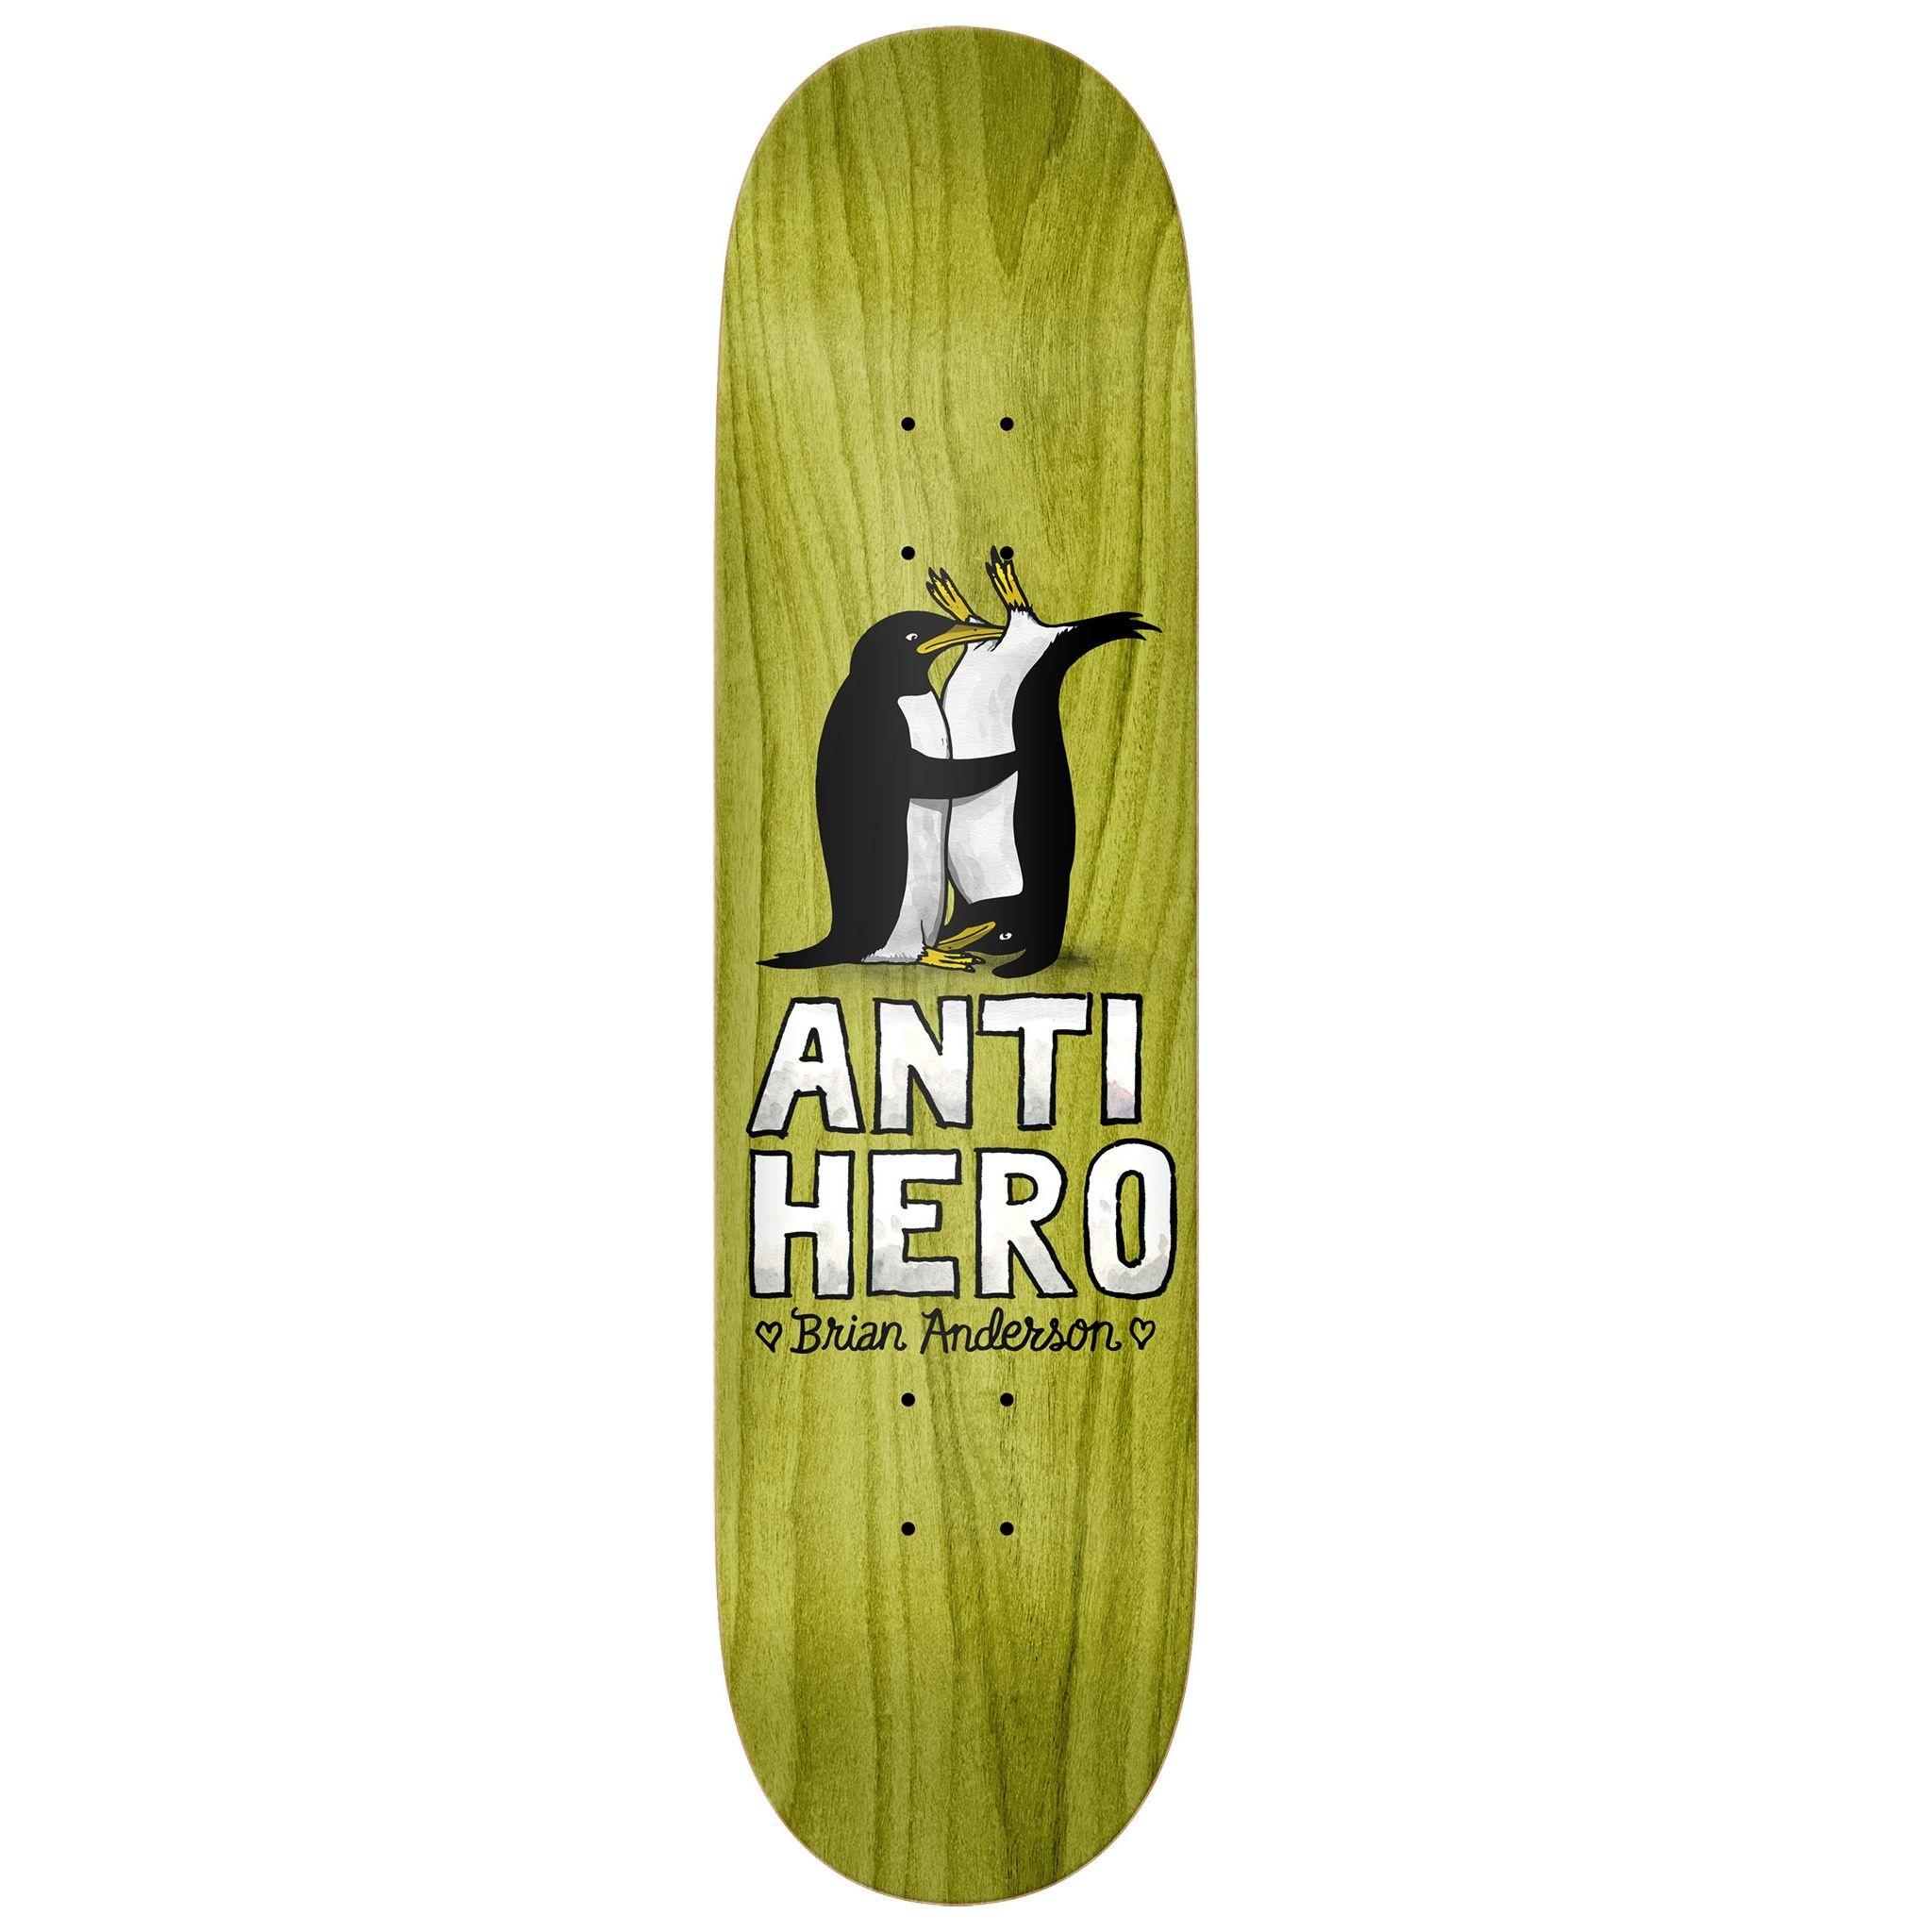 ANTIHERO ANTI HERO B.A. FOR LOVERS 8.18